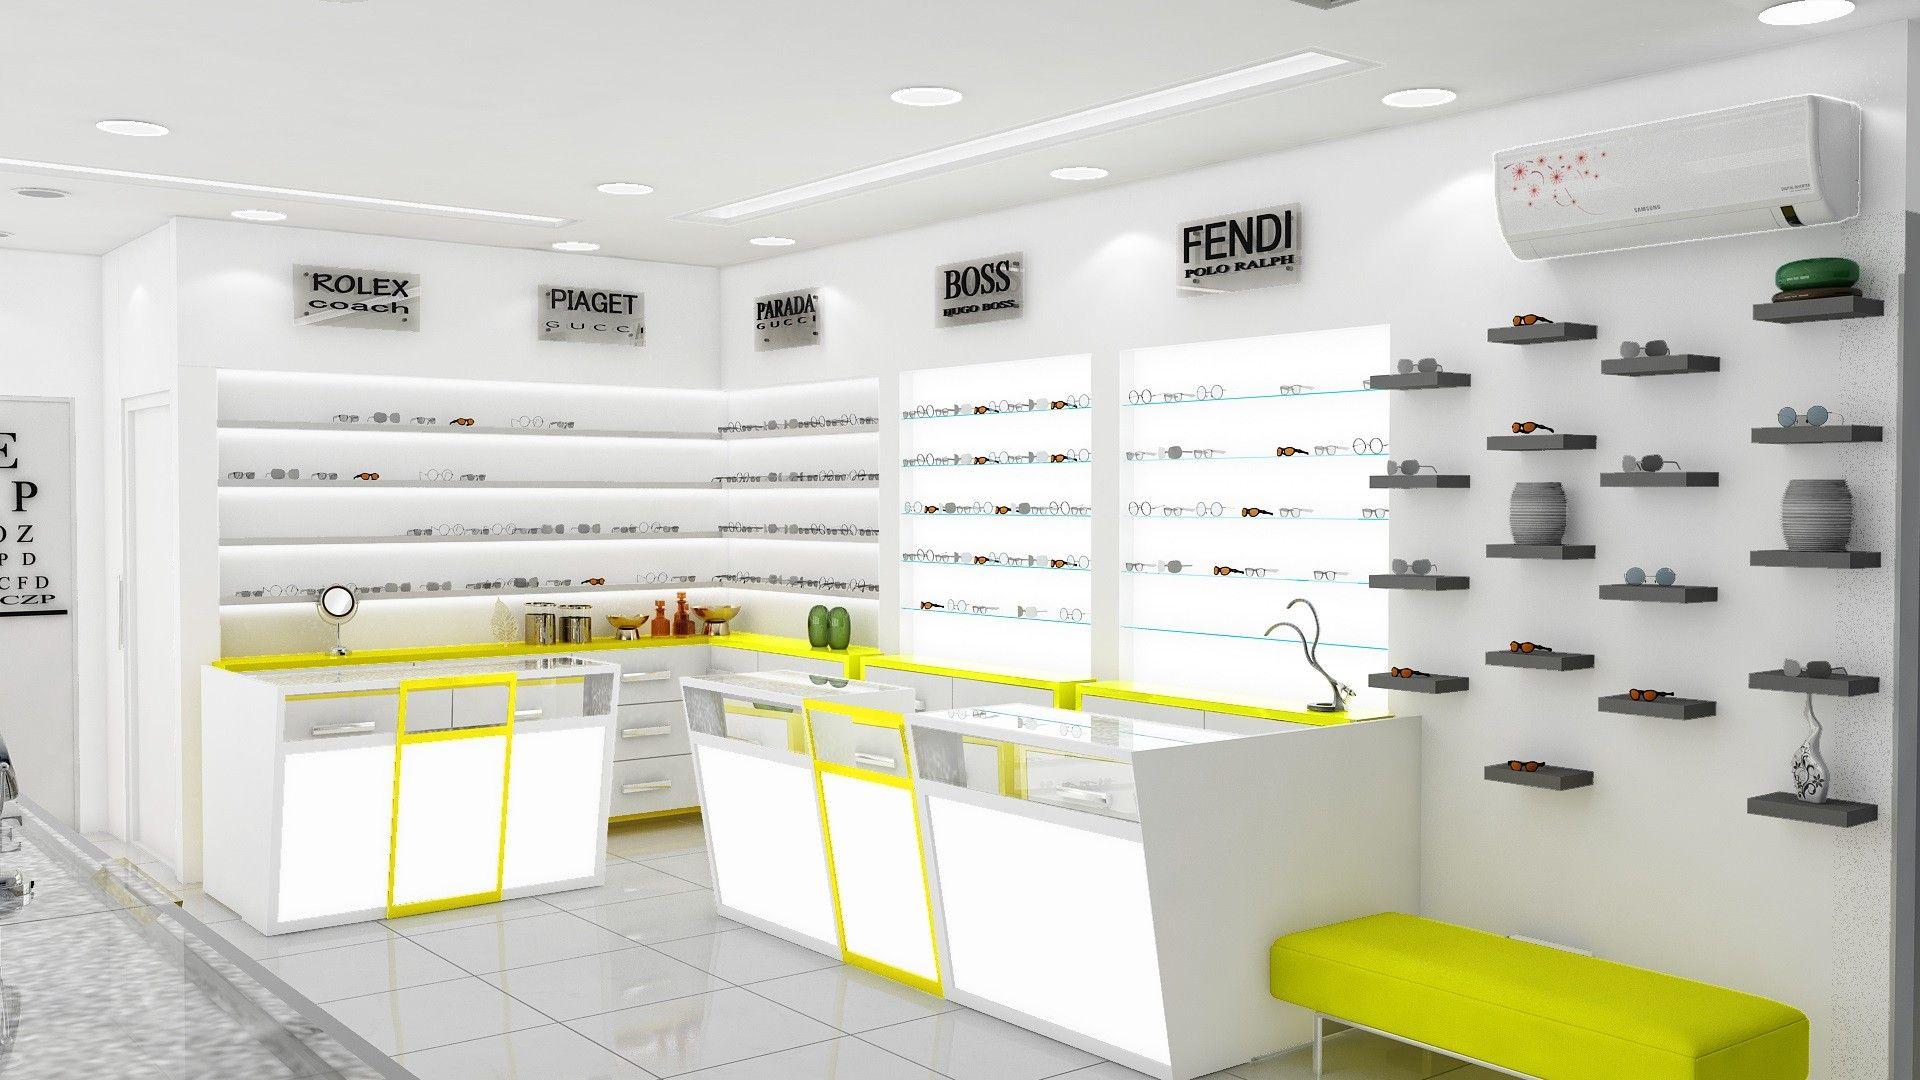 Optical Shop Interior Shop Interiors Shop Interior Design Shop Interior Showroom showcase eye candy